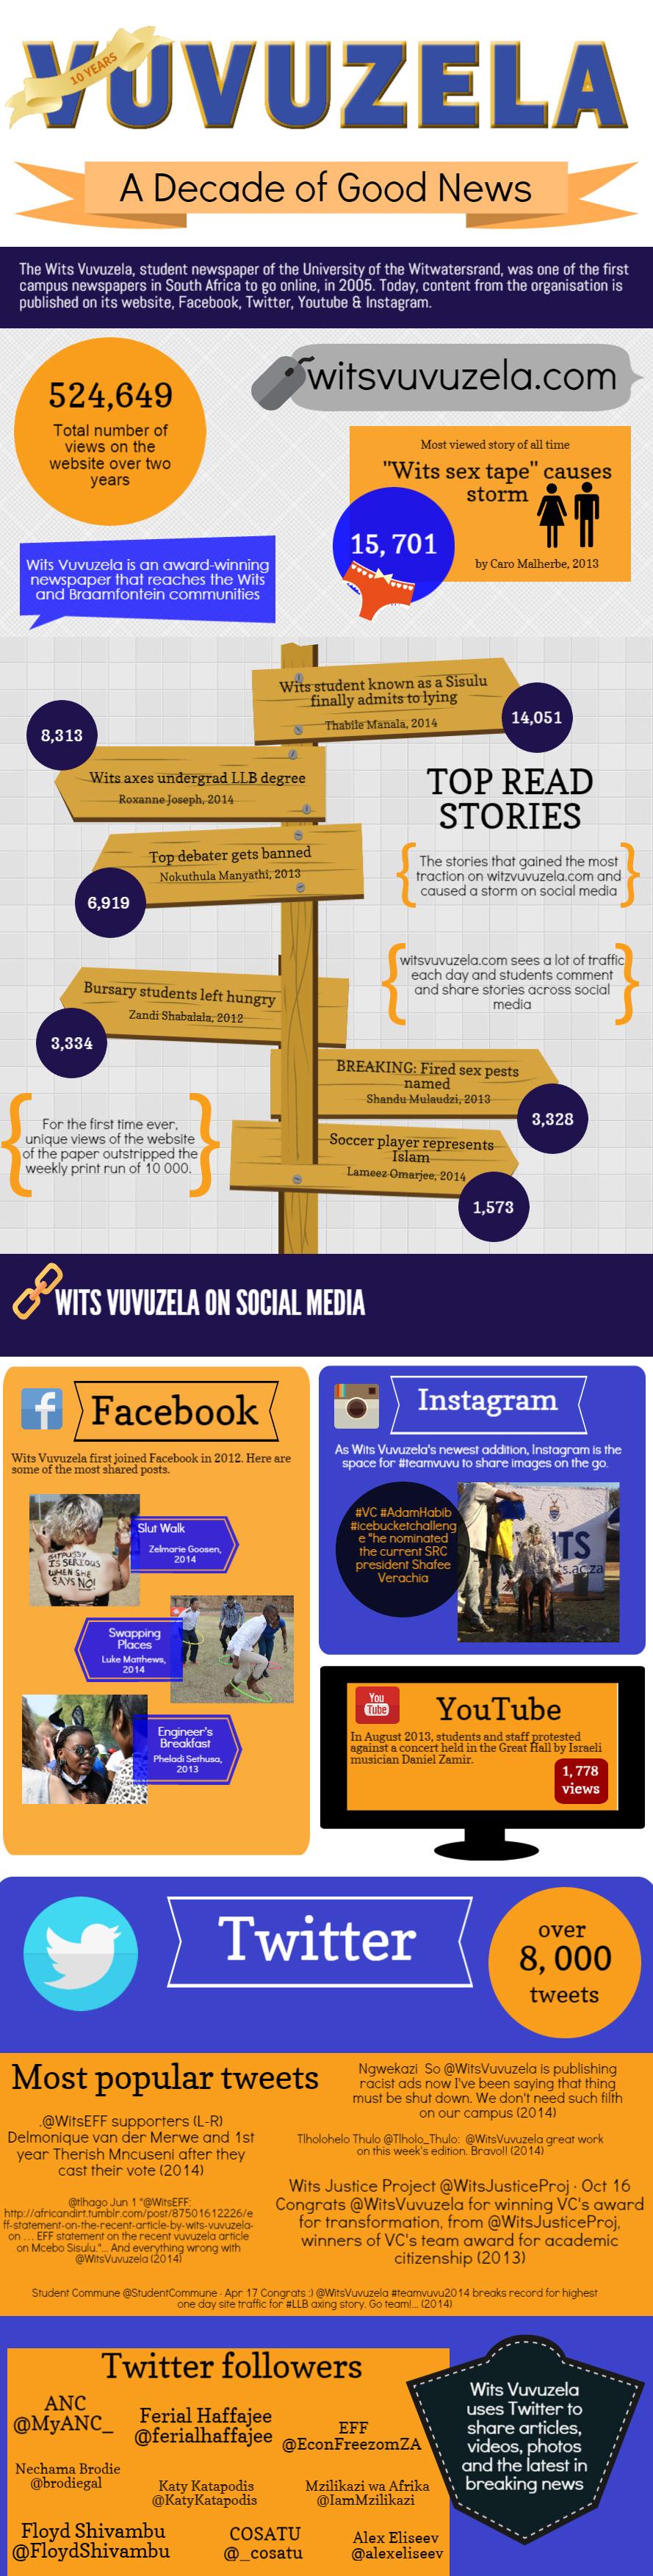 10 years of Wits Vuvuzela